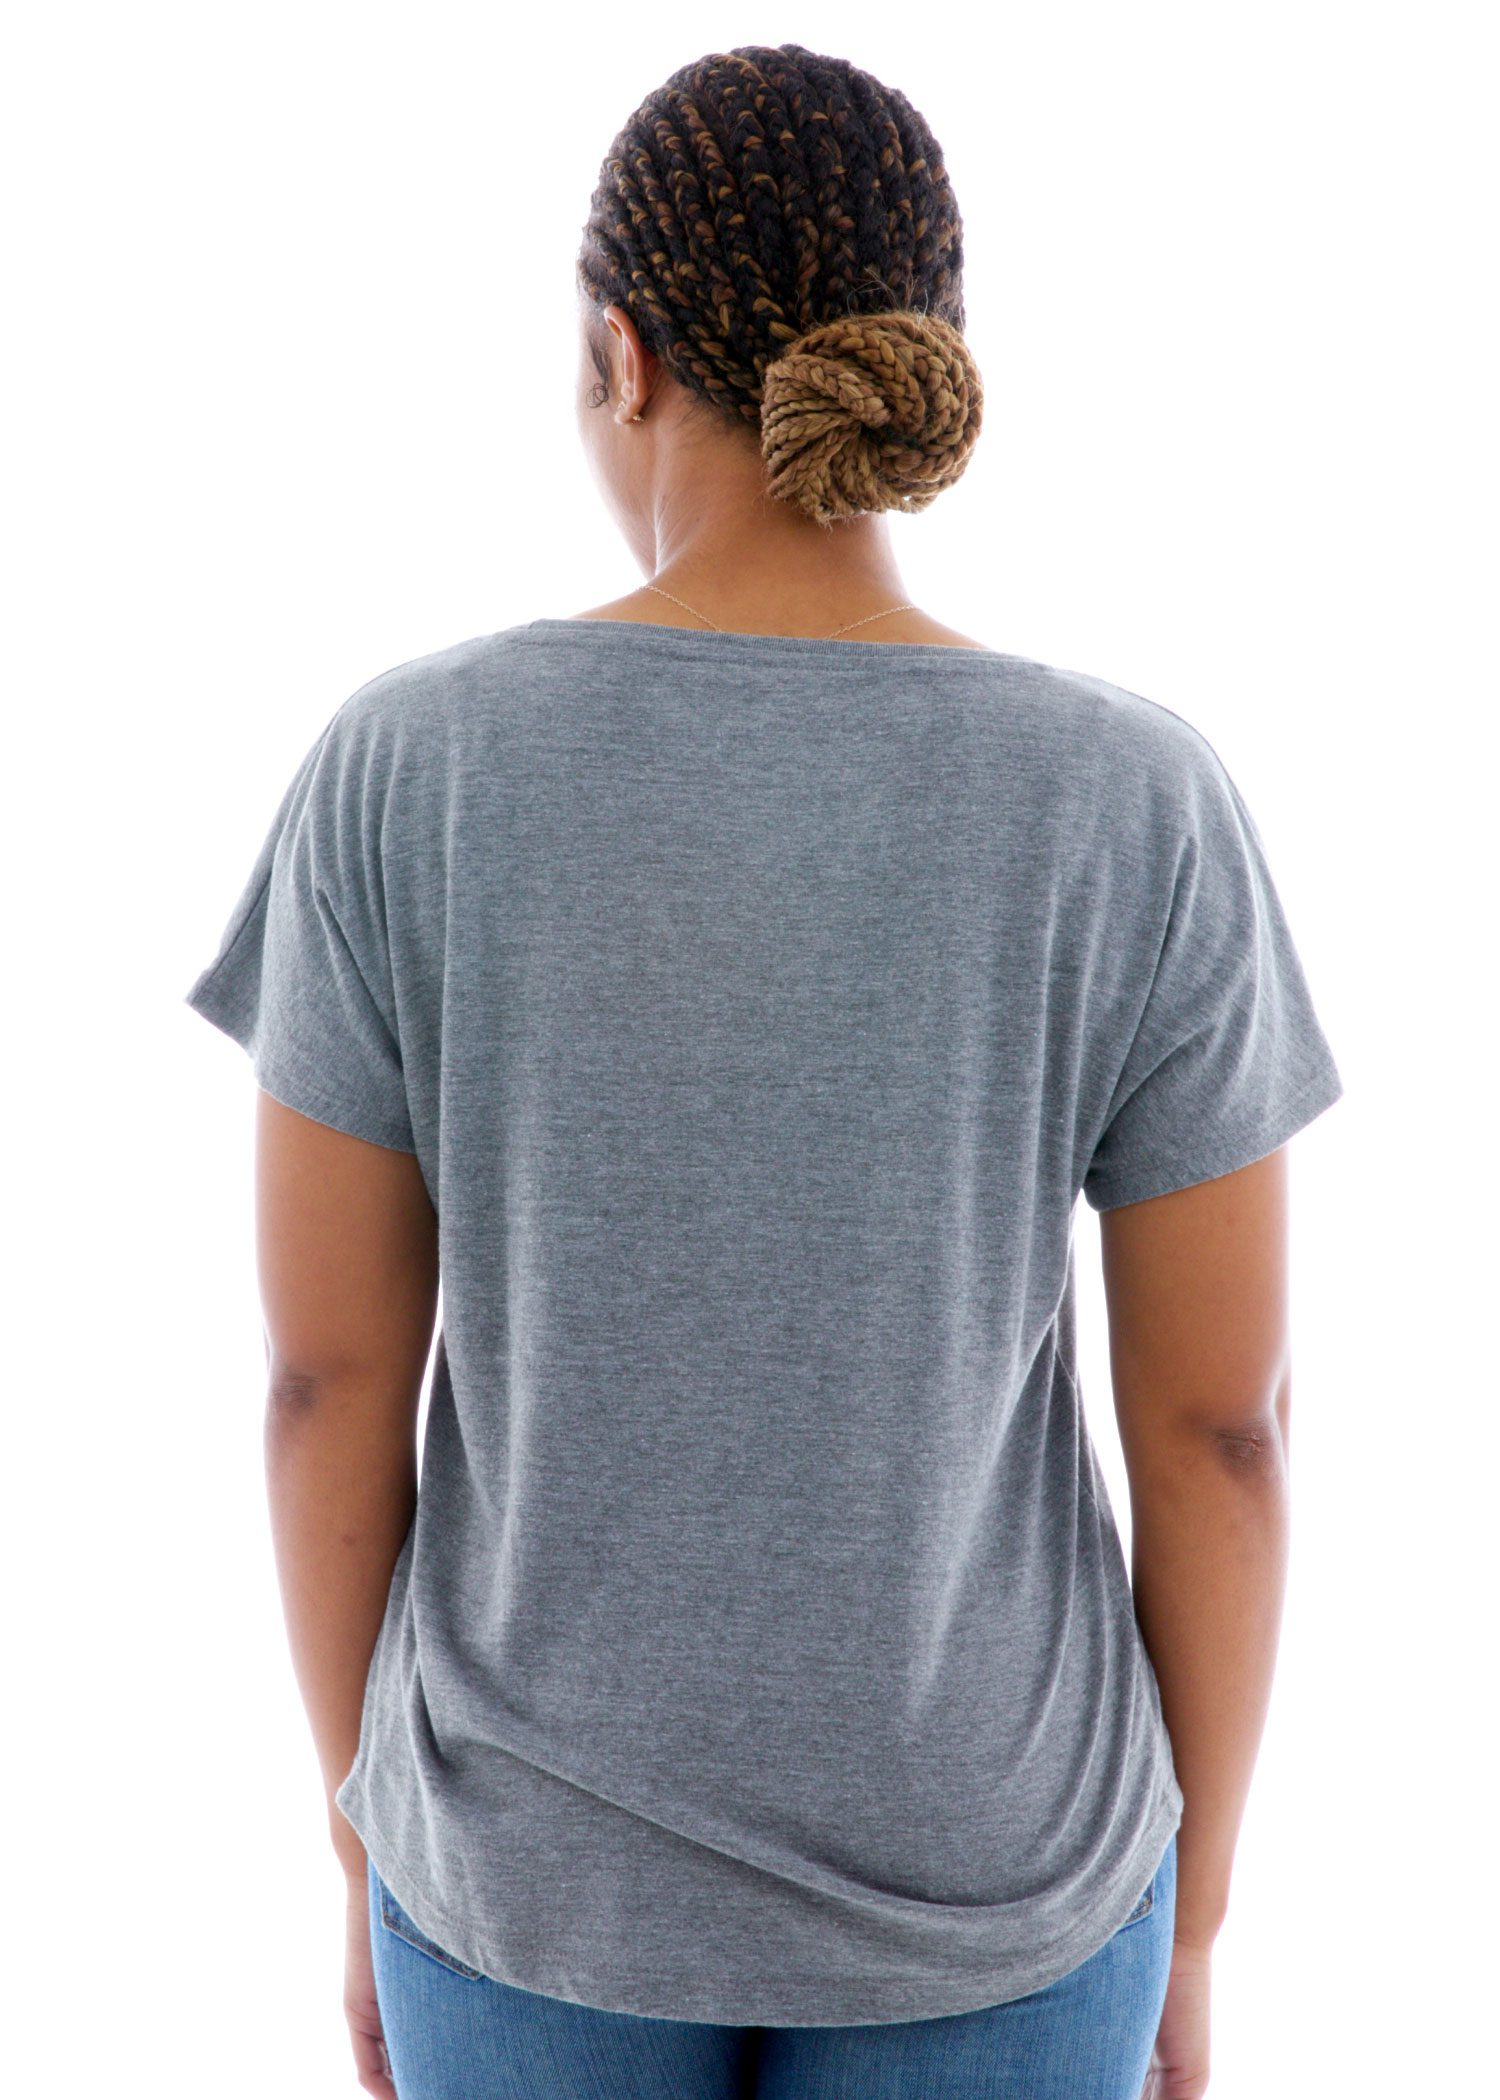 Triblend Dolman Short Sleeve T-Shirt Back View